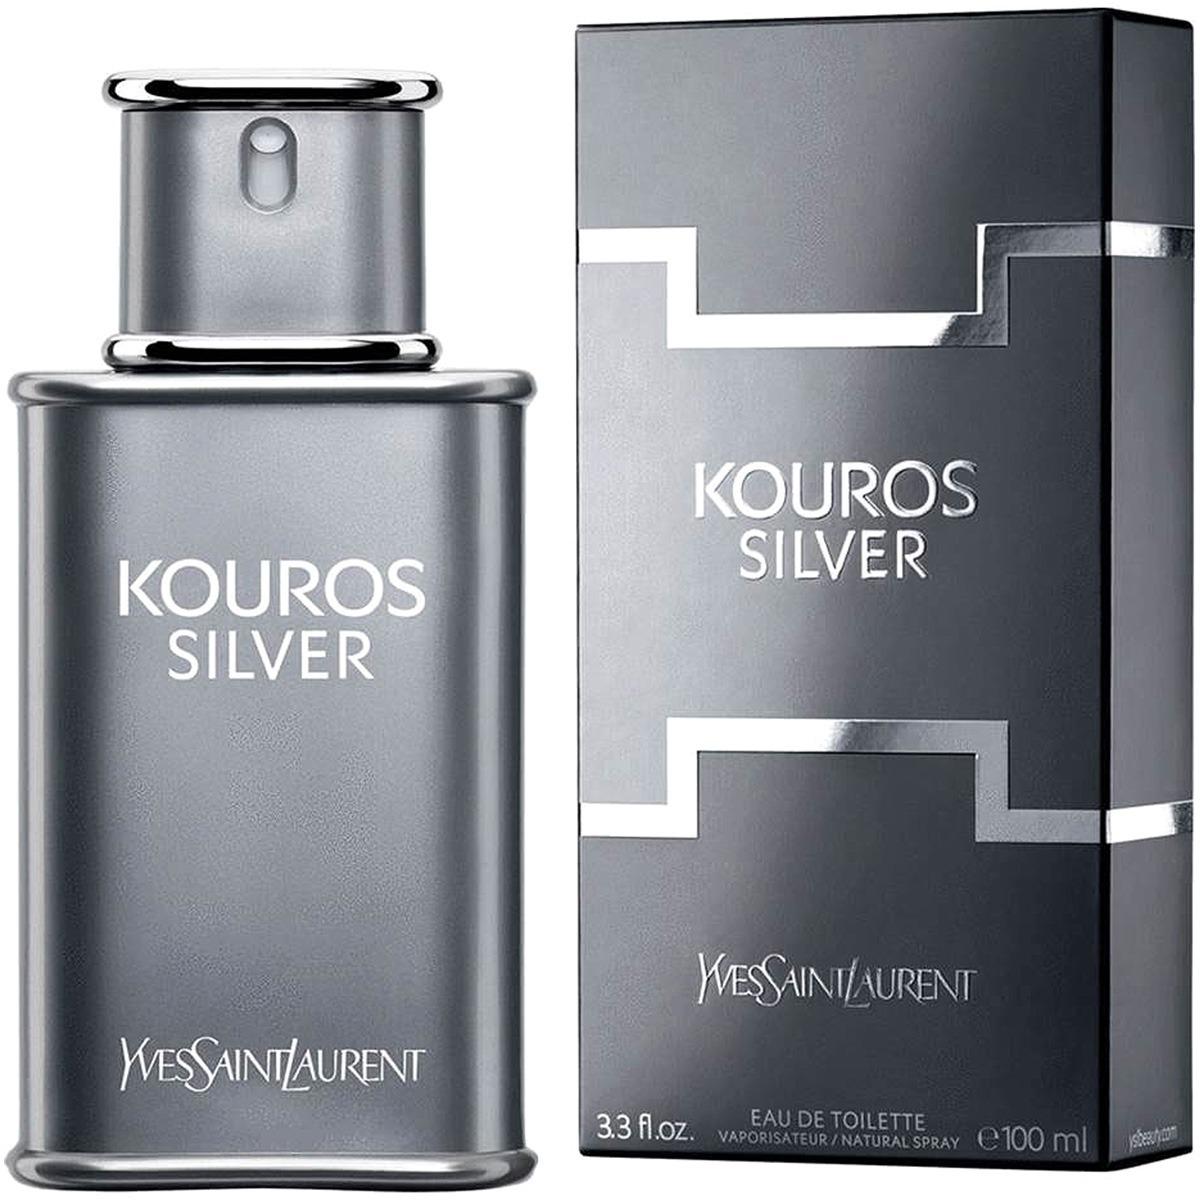 8cbadb2686 Perfume Masculino Kouros Silver Ysl 50 Ml Edt C  Selo Adipec - R  209